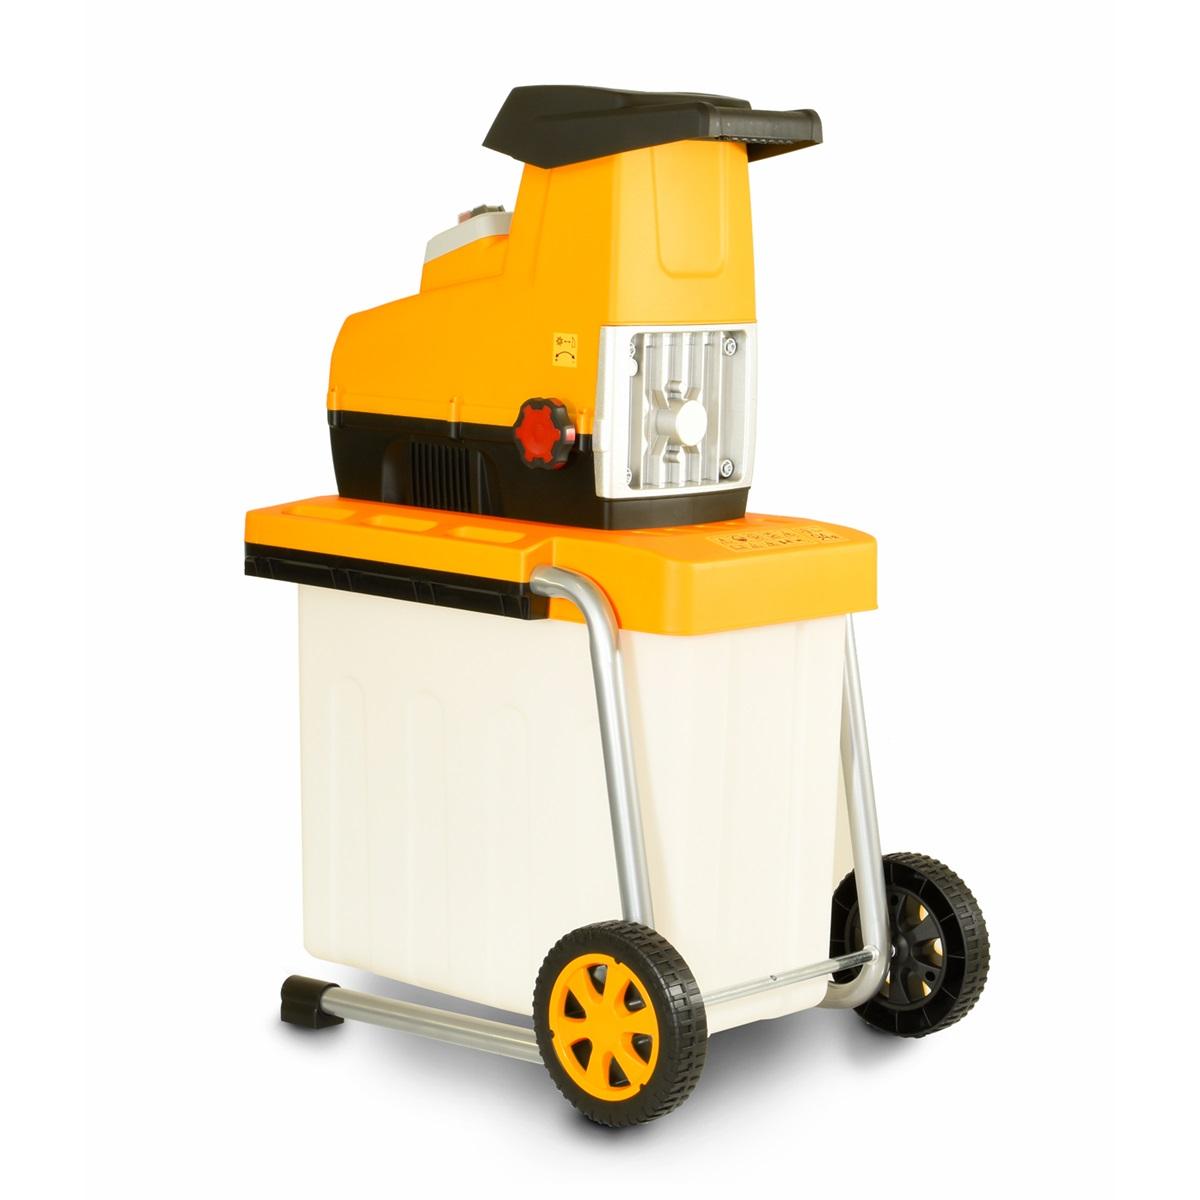 Riwall PRO RES 2844 B, válcový drvič s transparentním  boxom a elektrickým motorom 2800 W